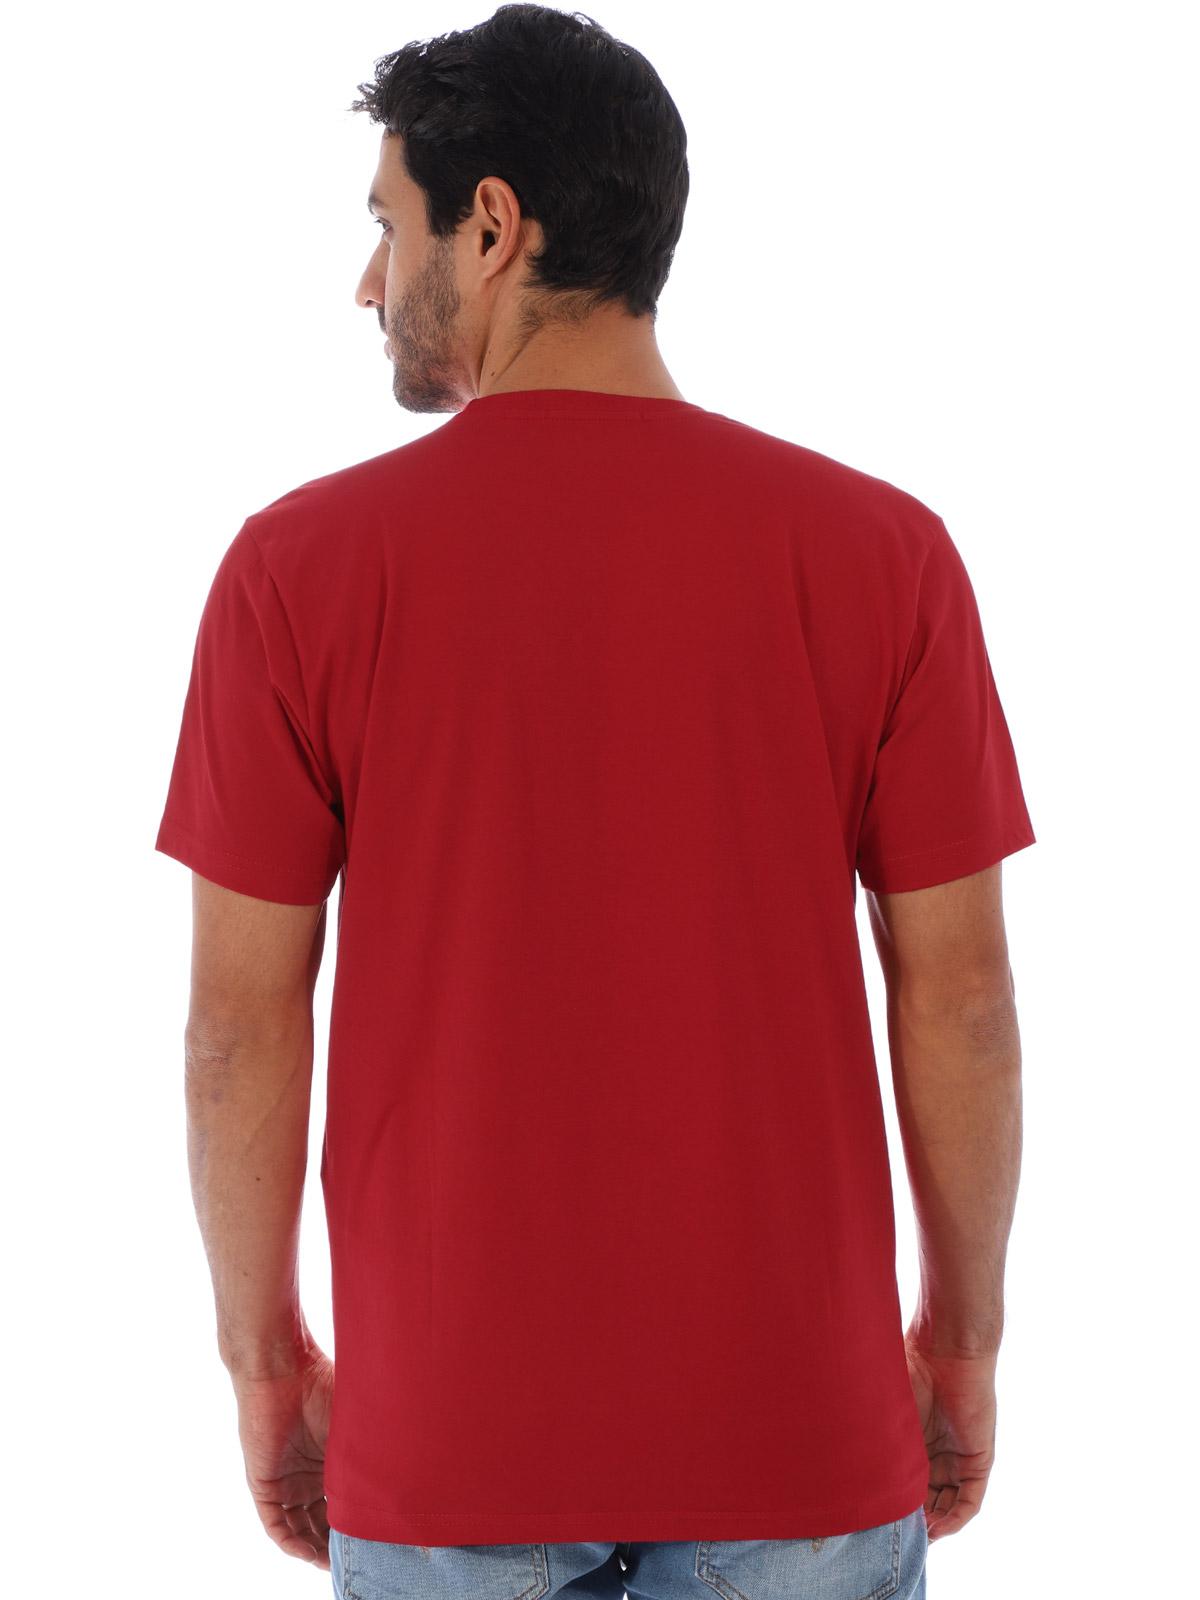 Camiseta Masculina Básica Estampa Ingredients Vermelho